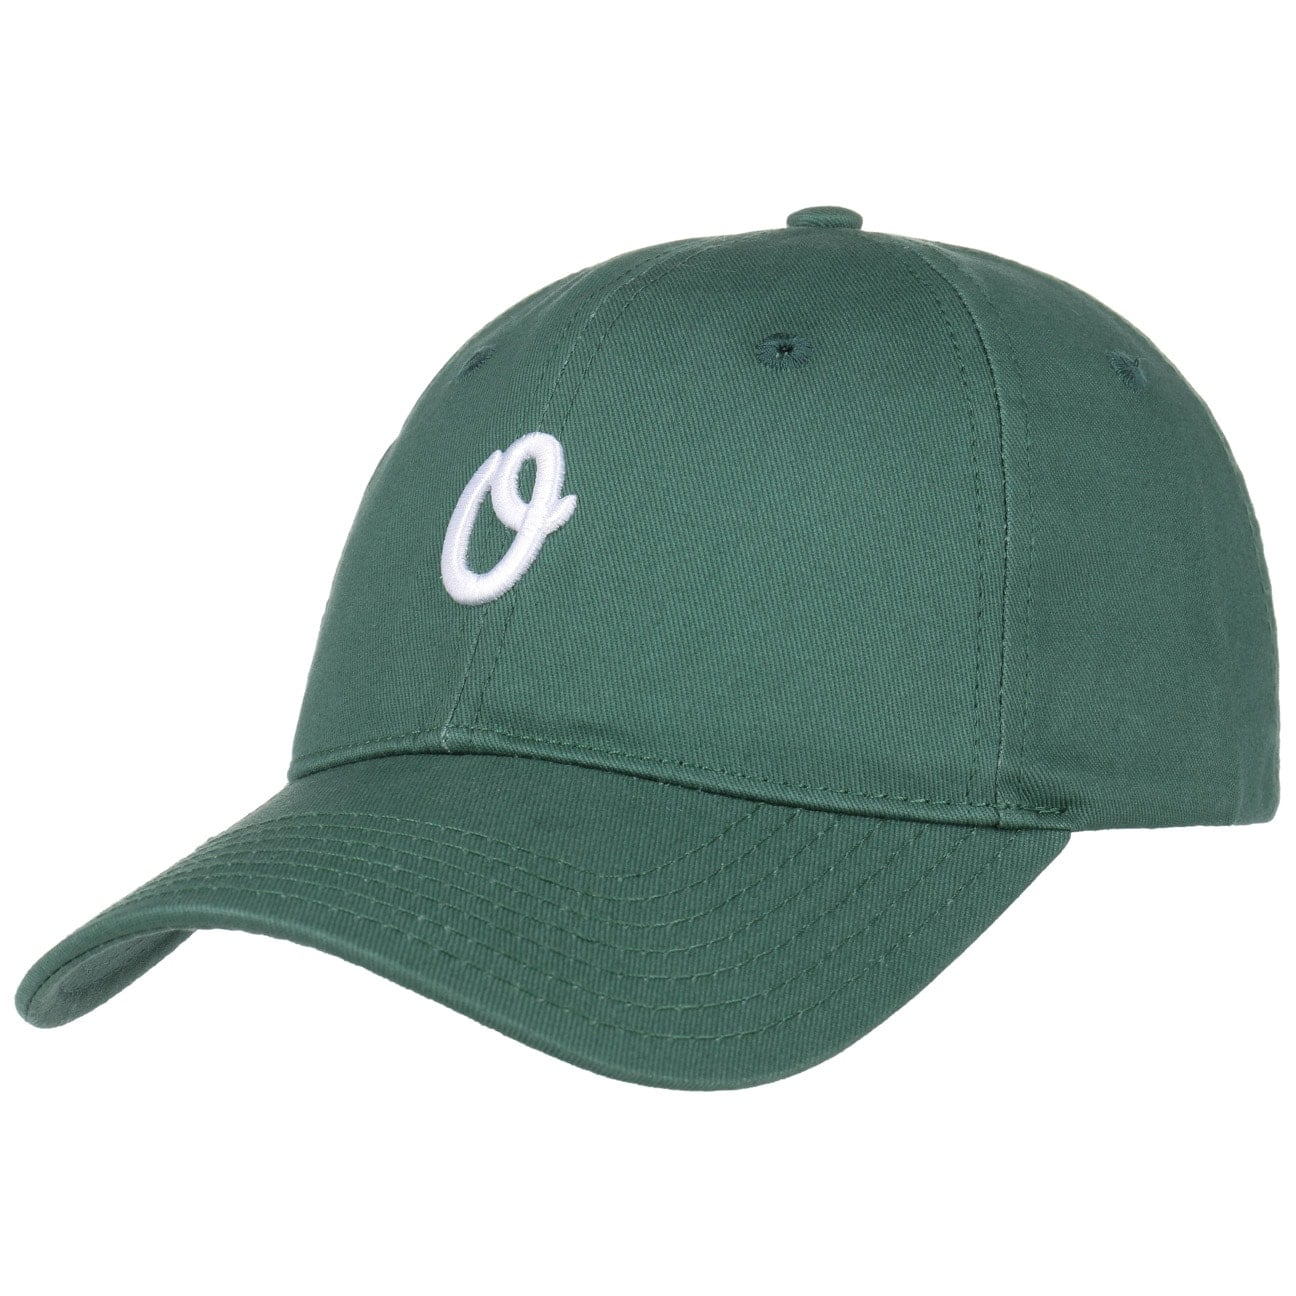 Gorra Miles Old Deporte by Official Headwear